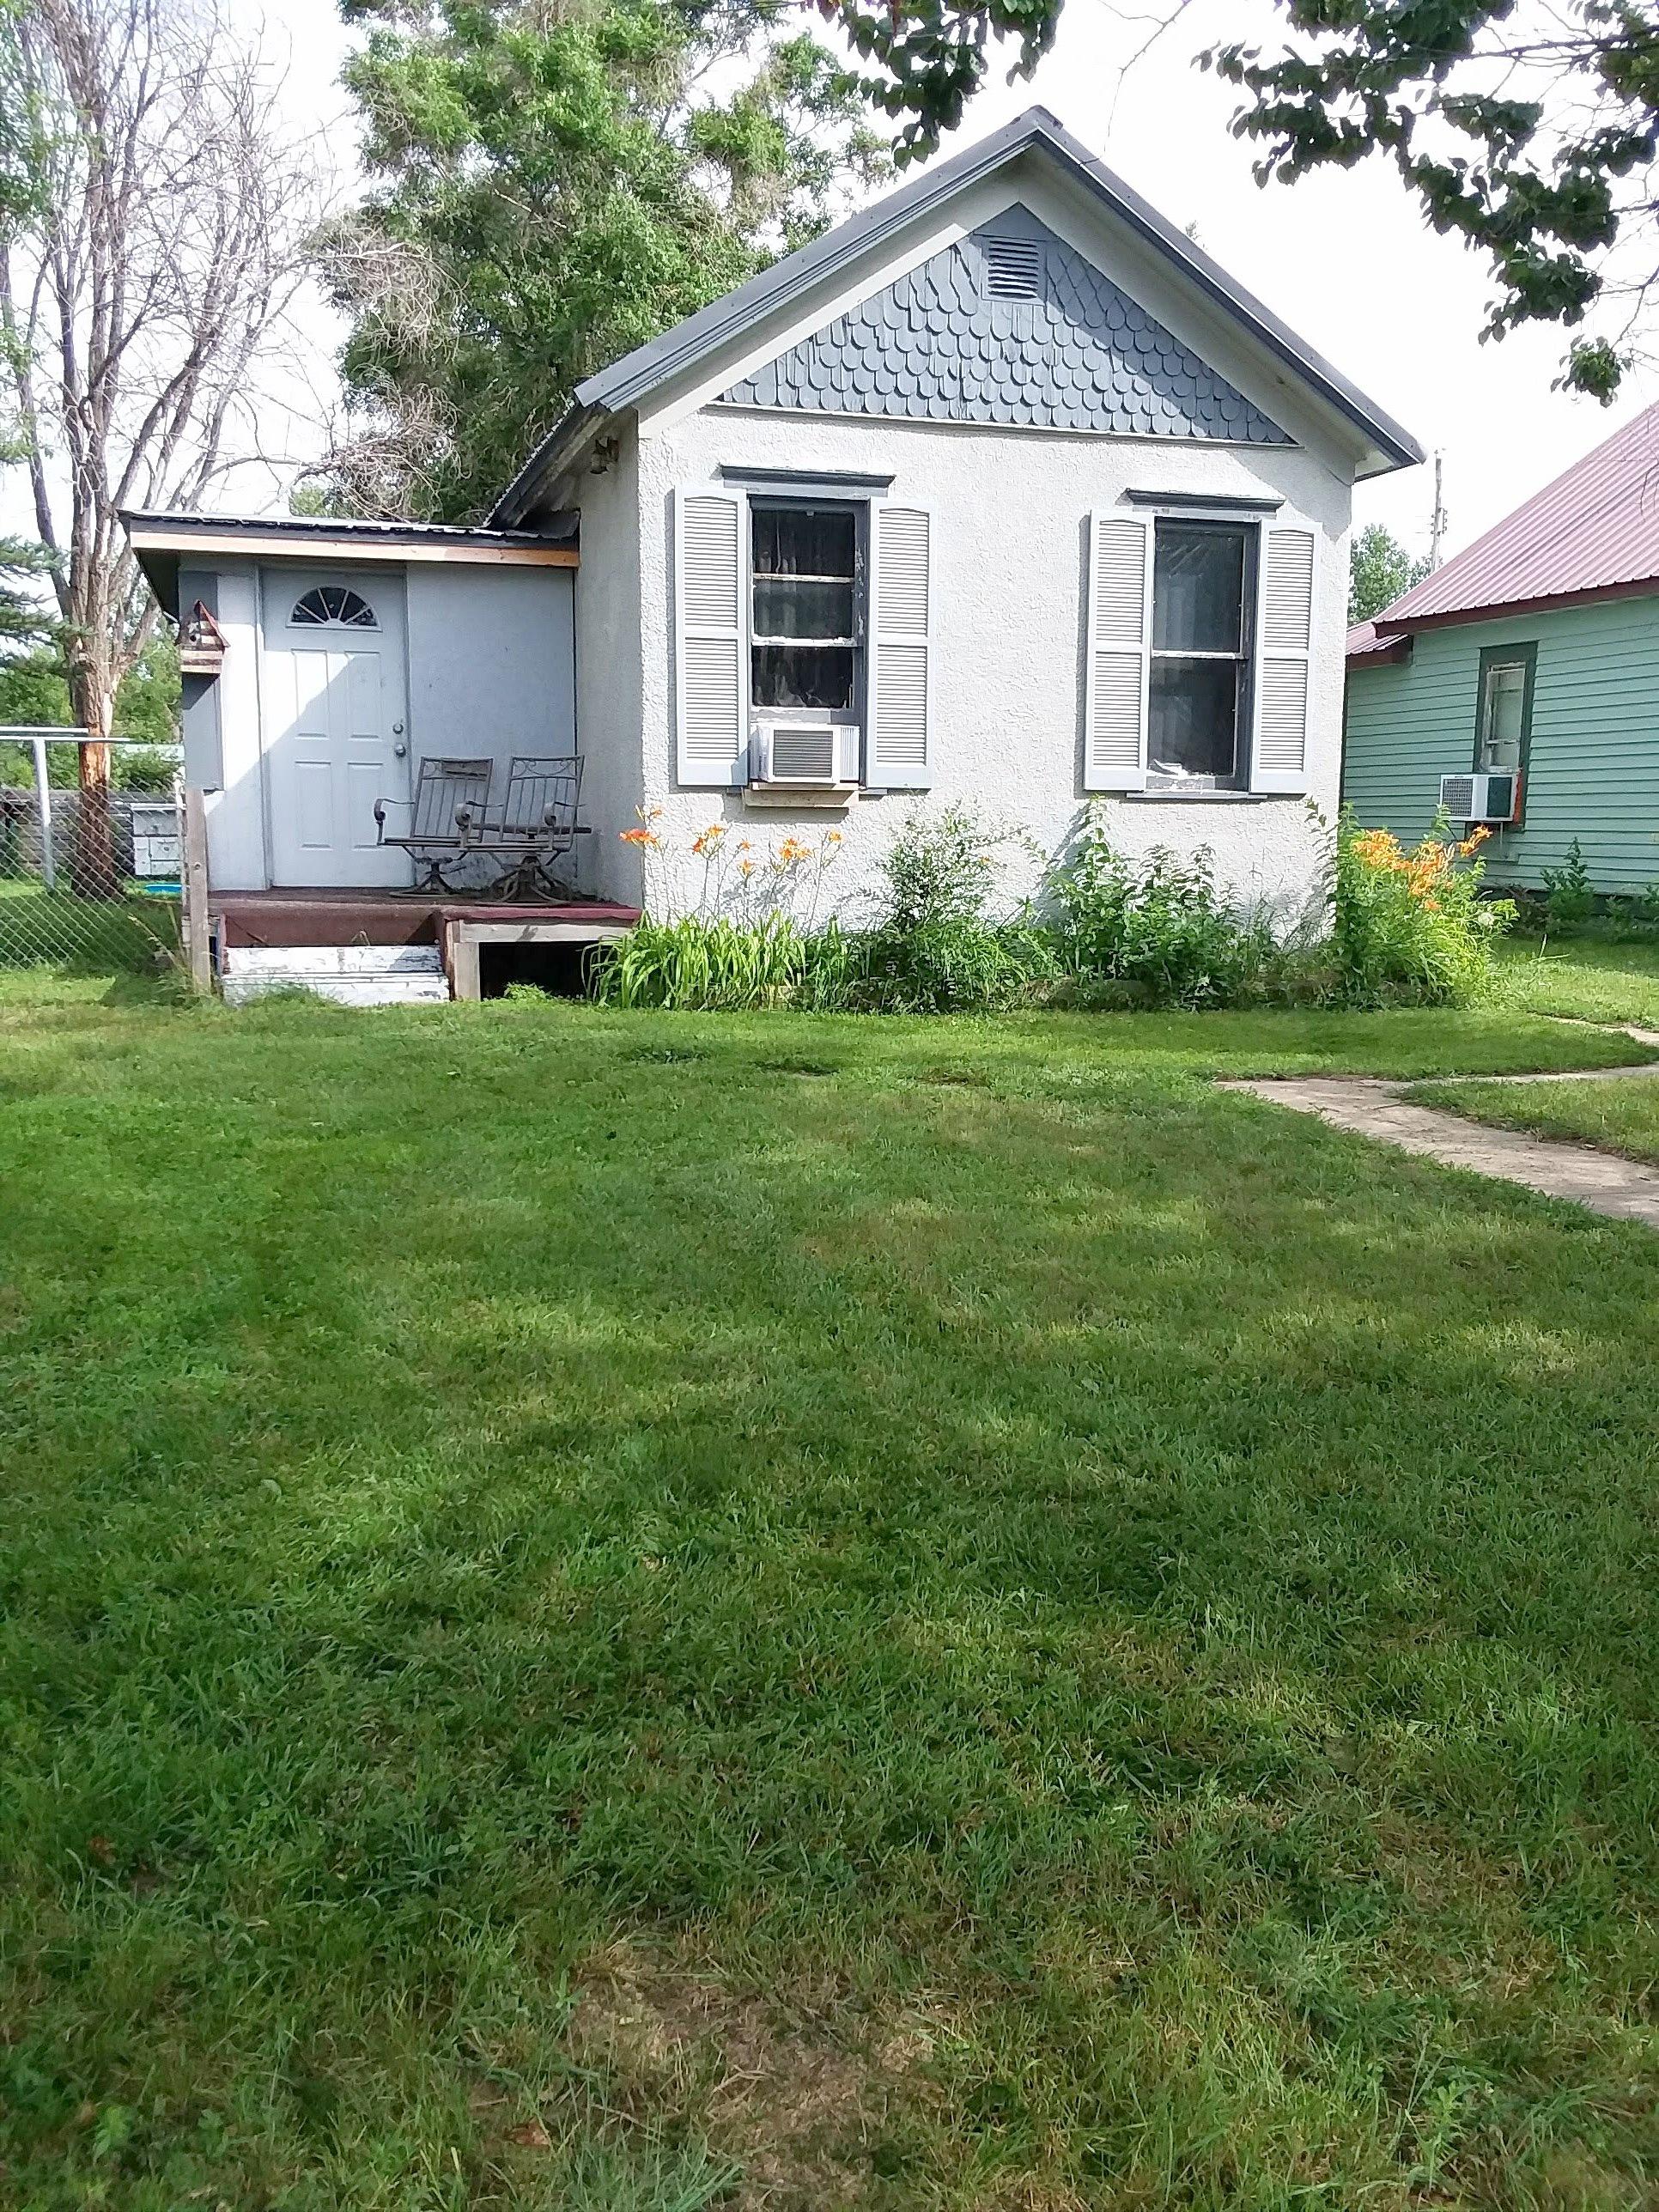 1 Bedrooms / 1 Bathrooms - Est. $460.00 / Month* for rent in Miles City, MT